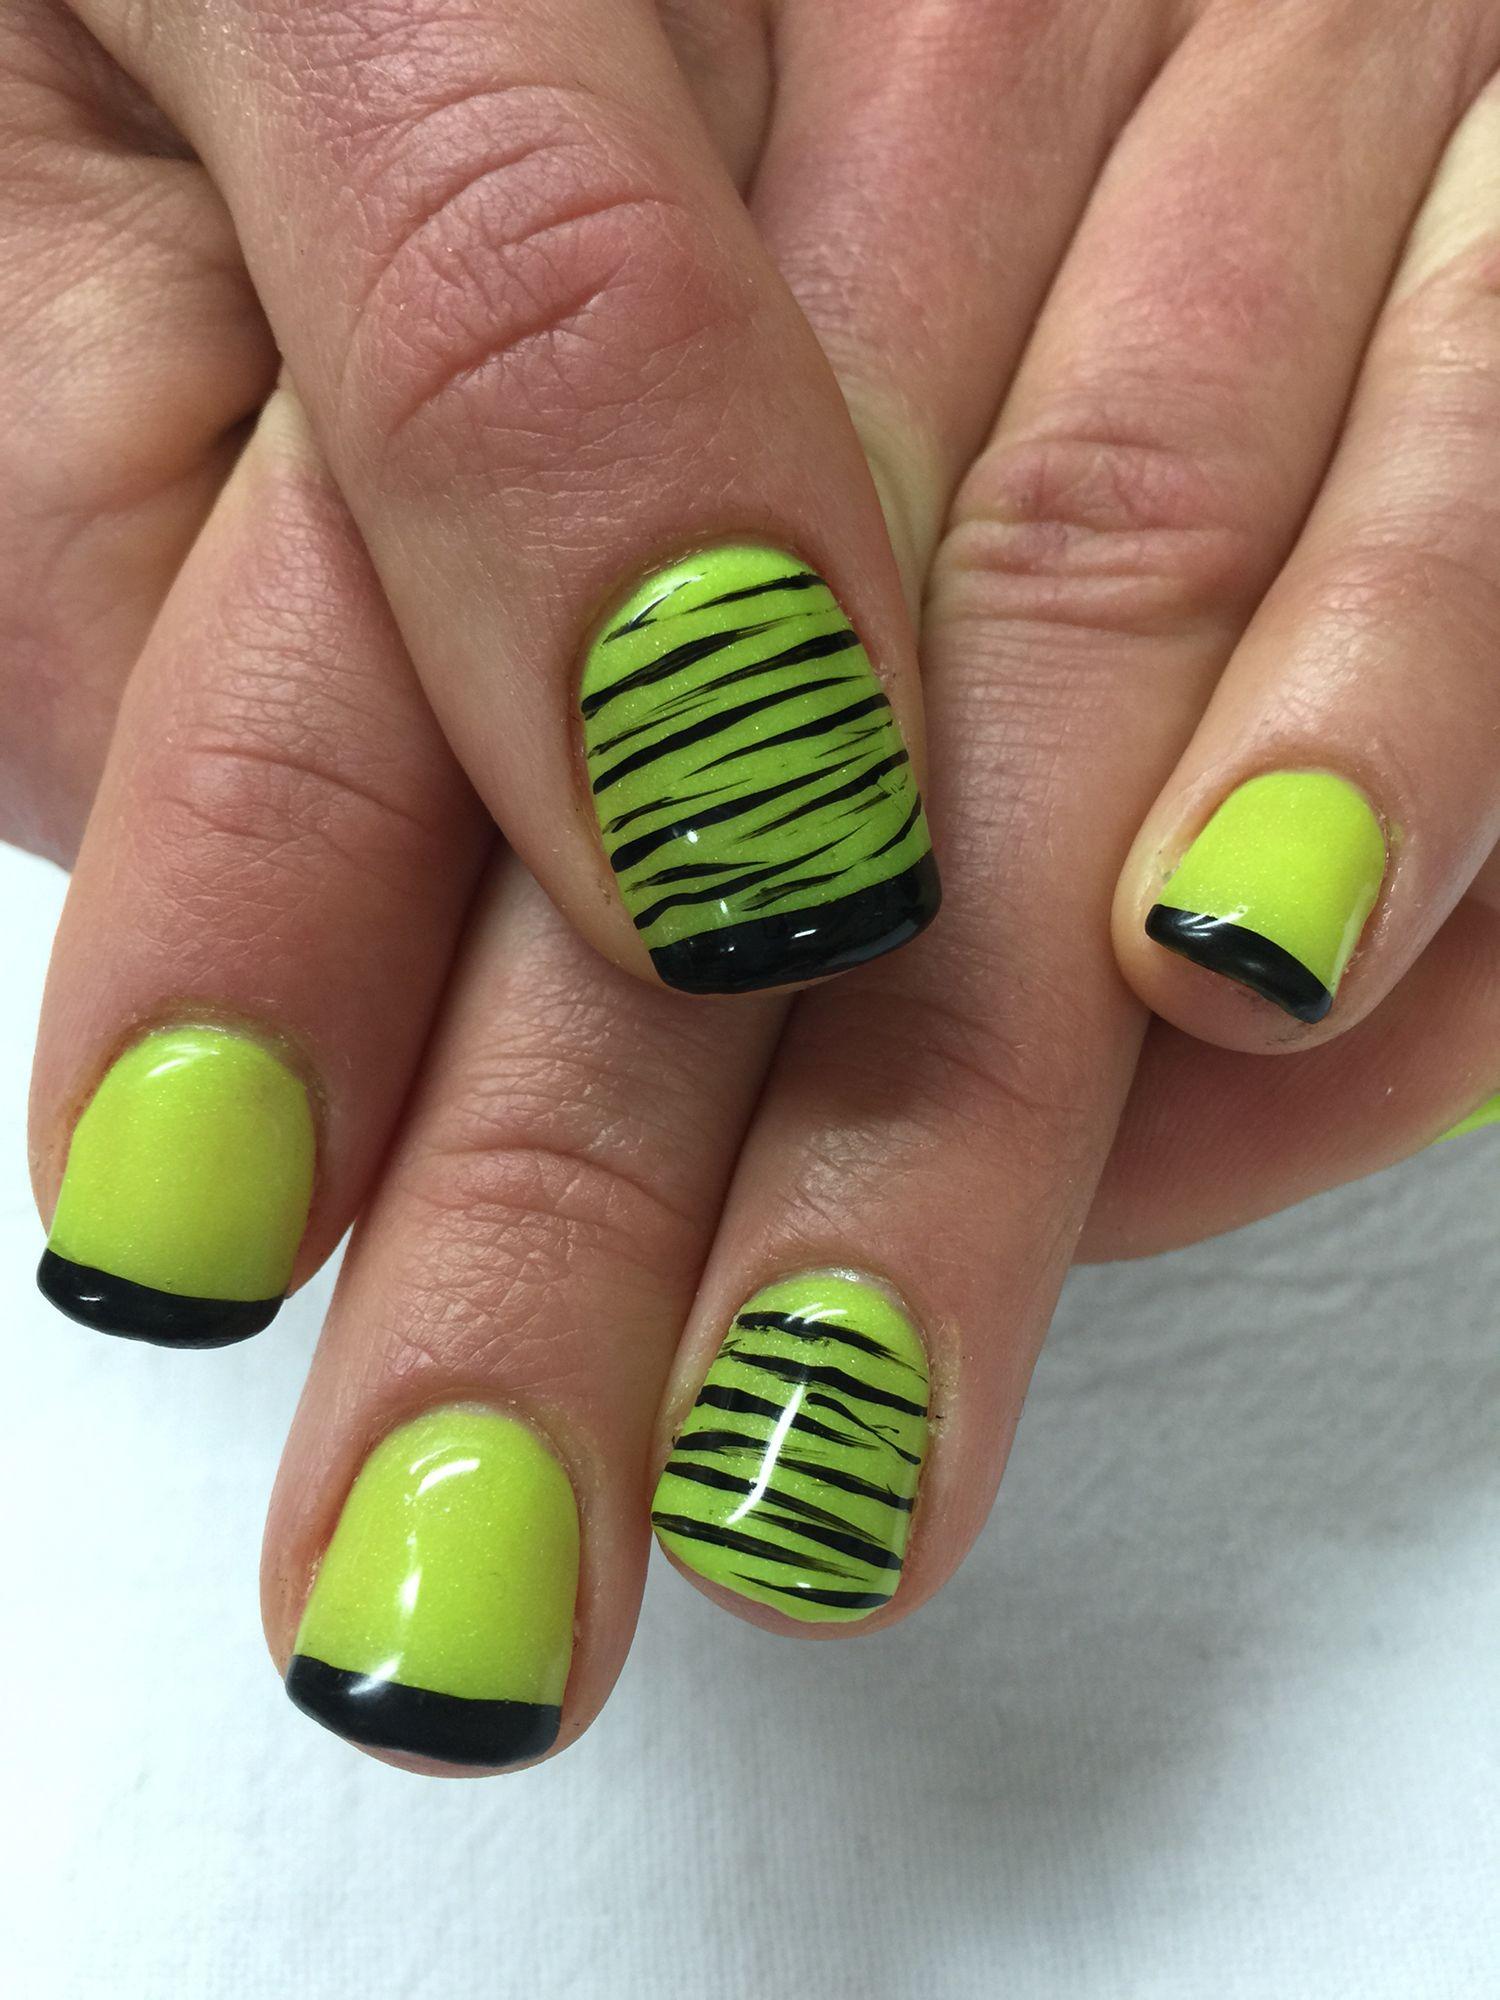 Wild, Glow in the dark neon yellow, black with zebra accented gel ...